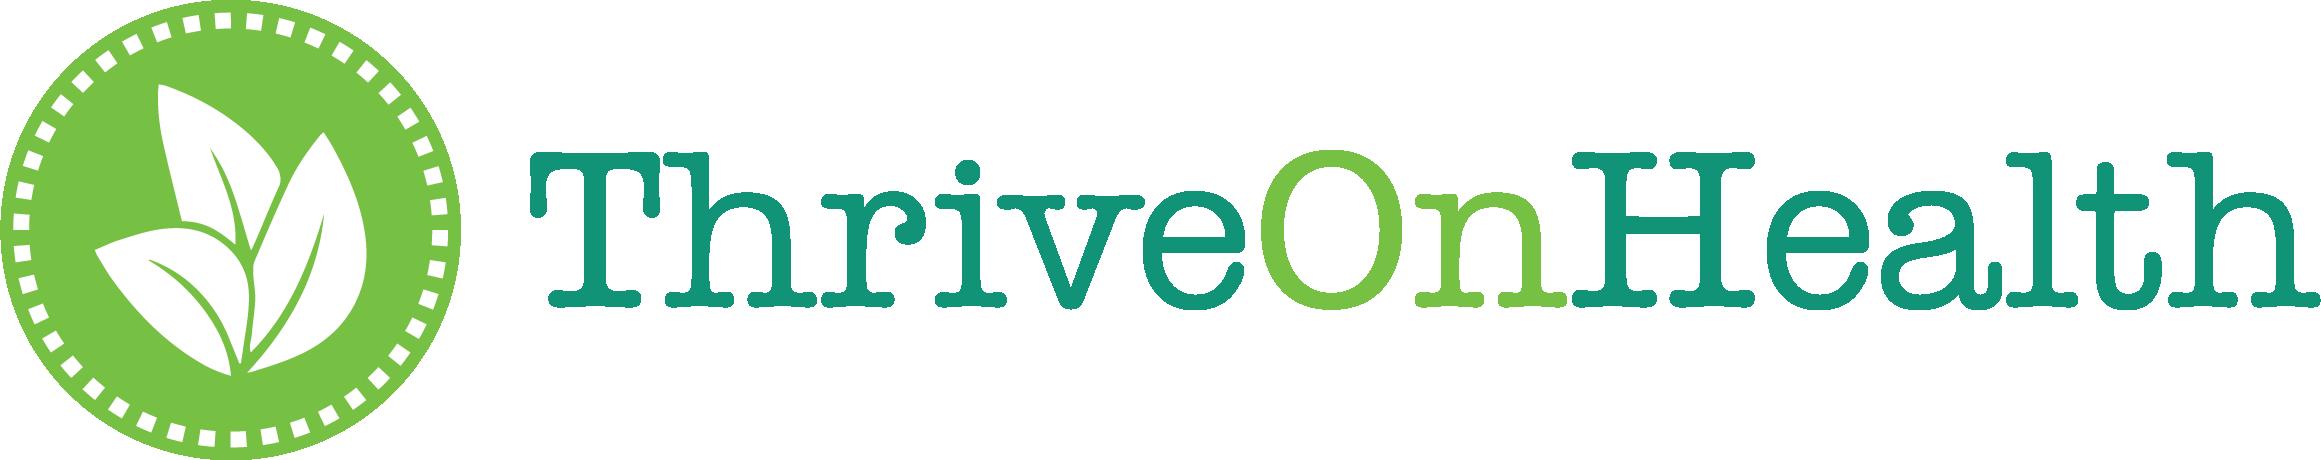 Thrive On Health Logo